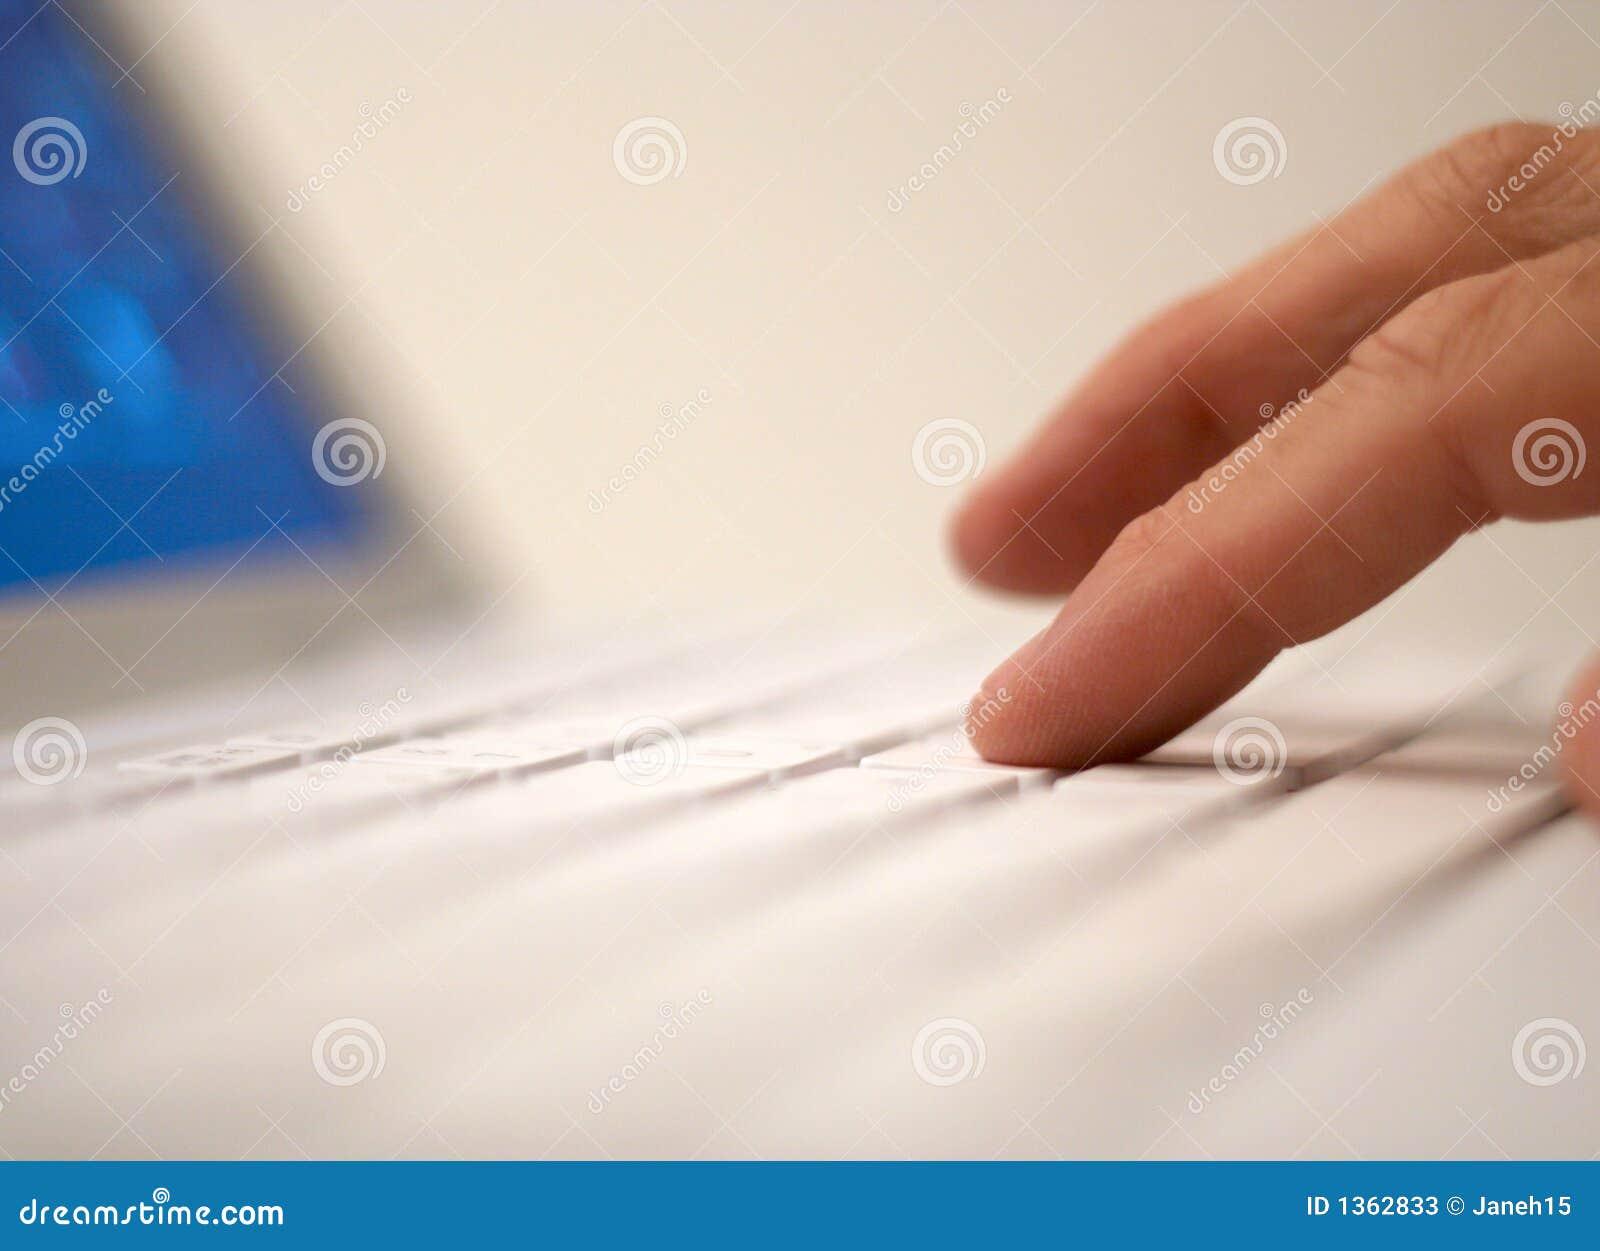 Usando o portátil